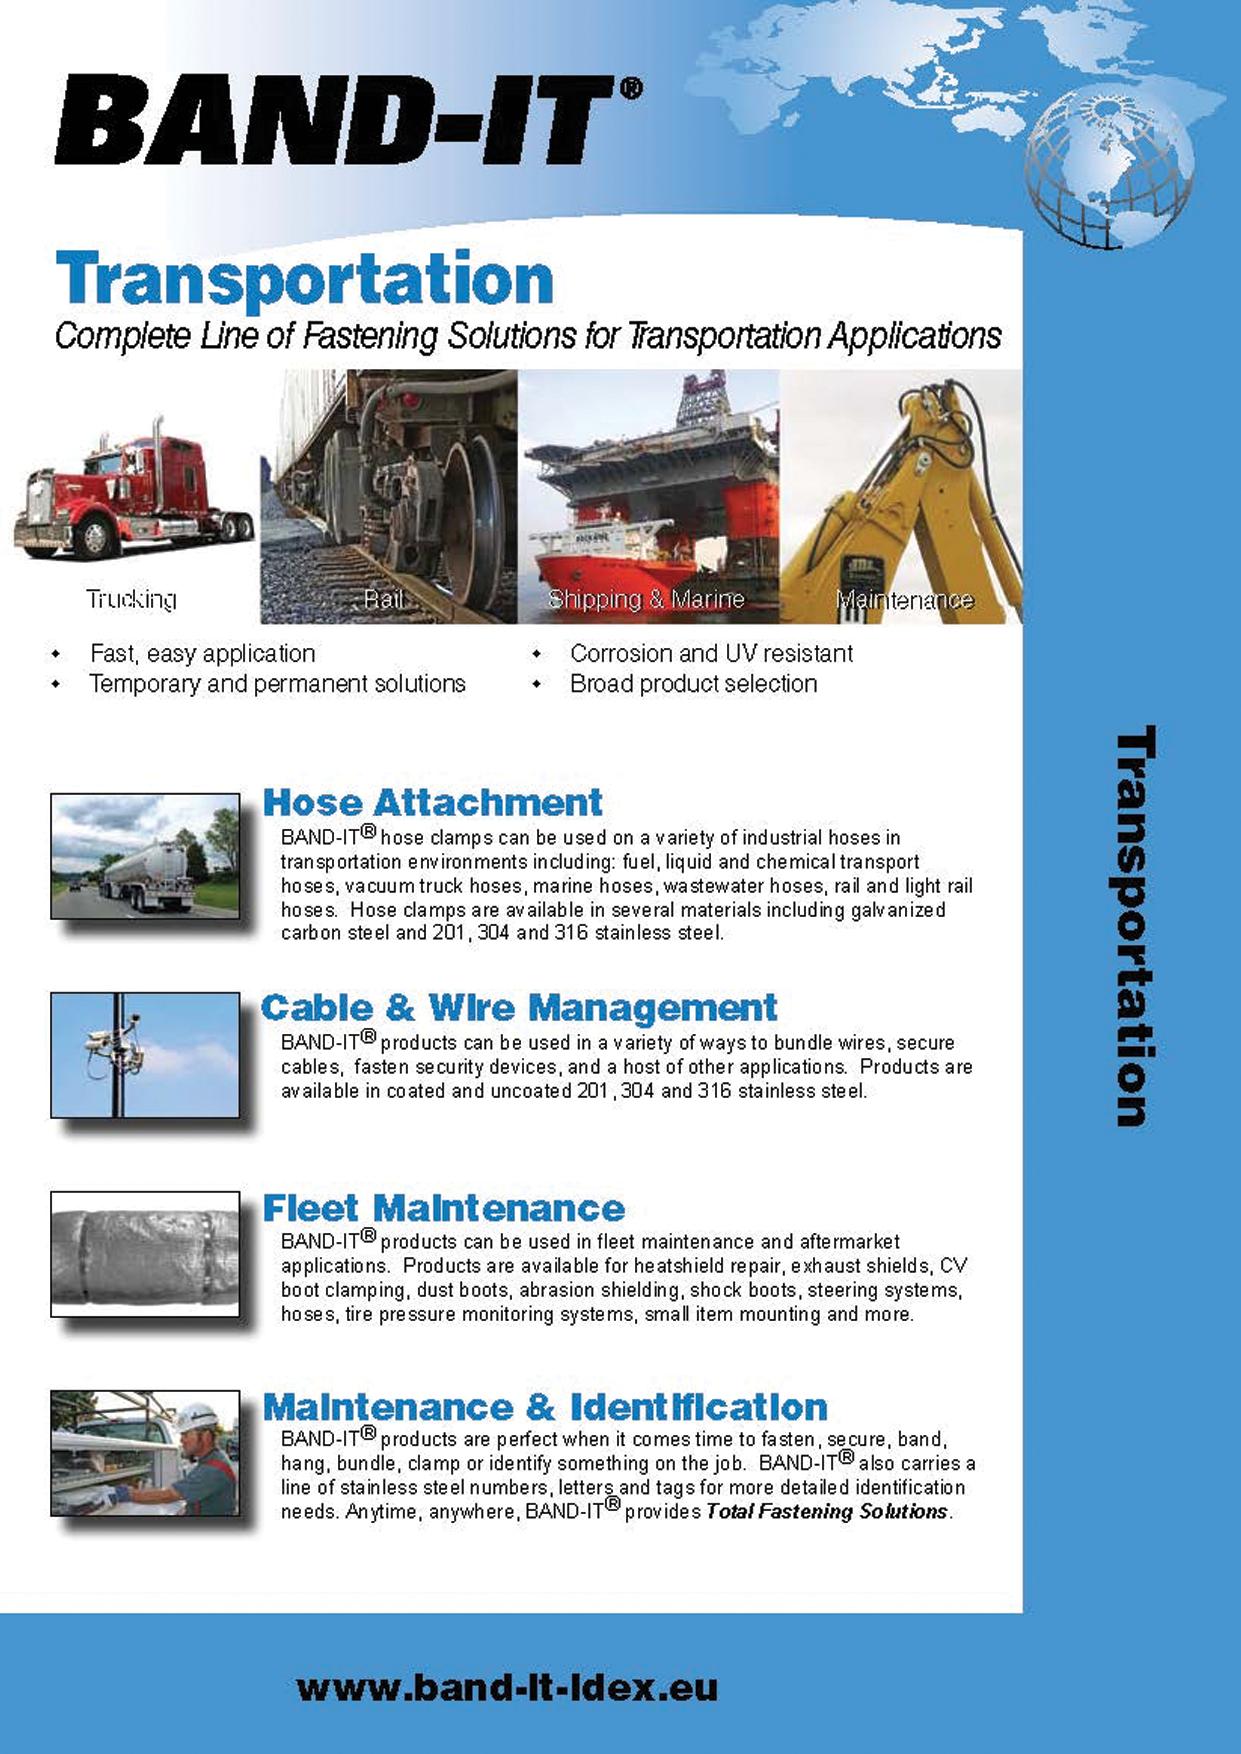 Transportation Industry - Complete Line of Fastening Solutions for Transportation Applications